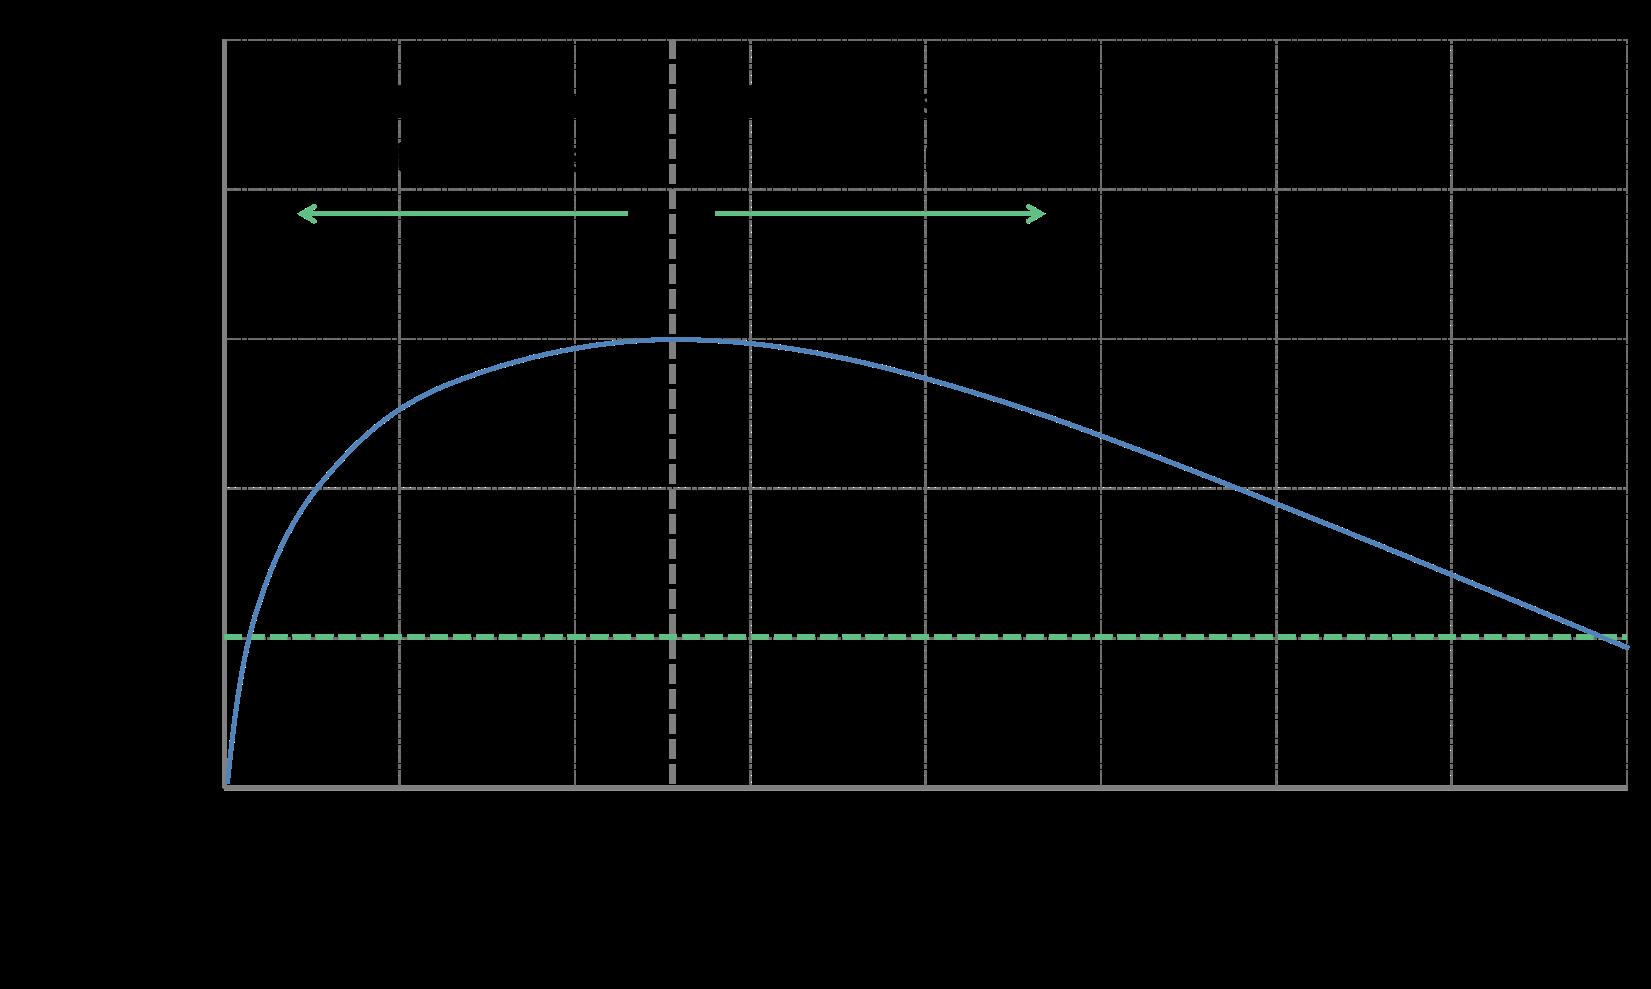 Products profitability chart